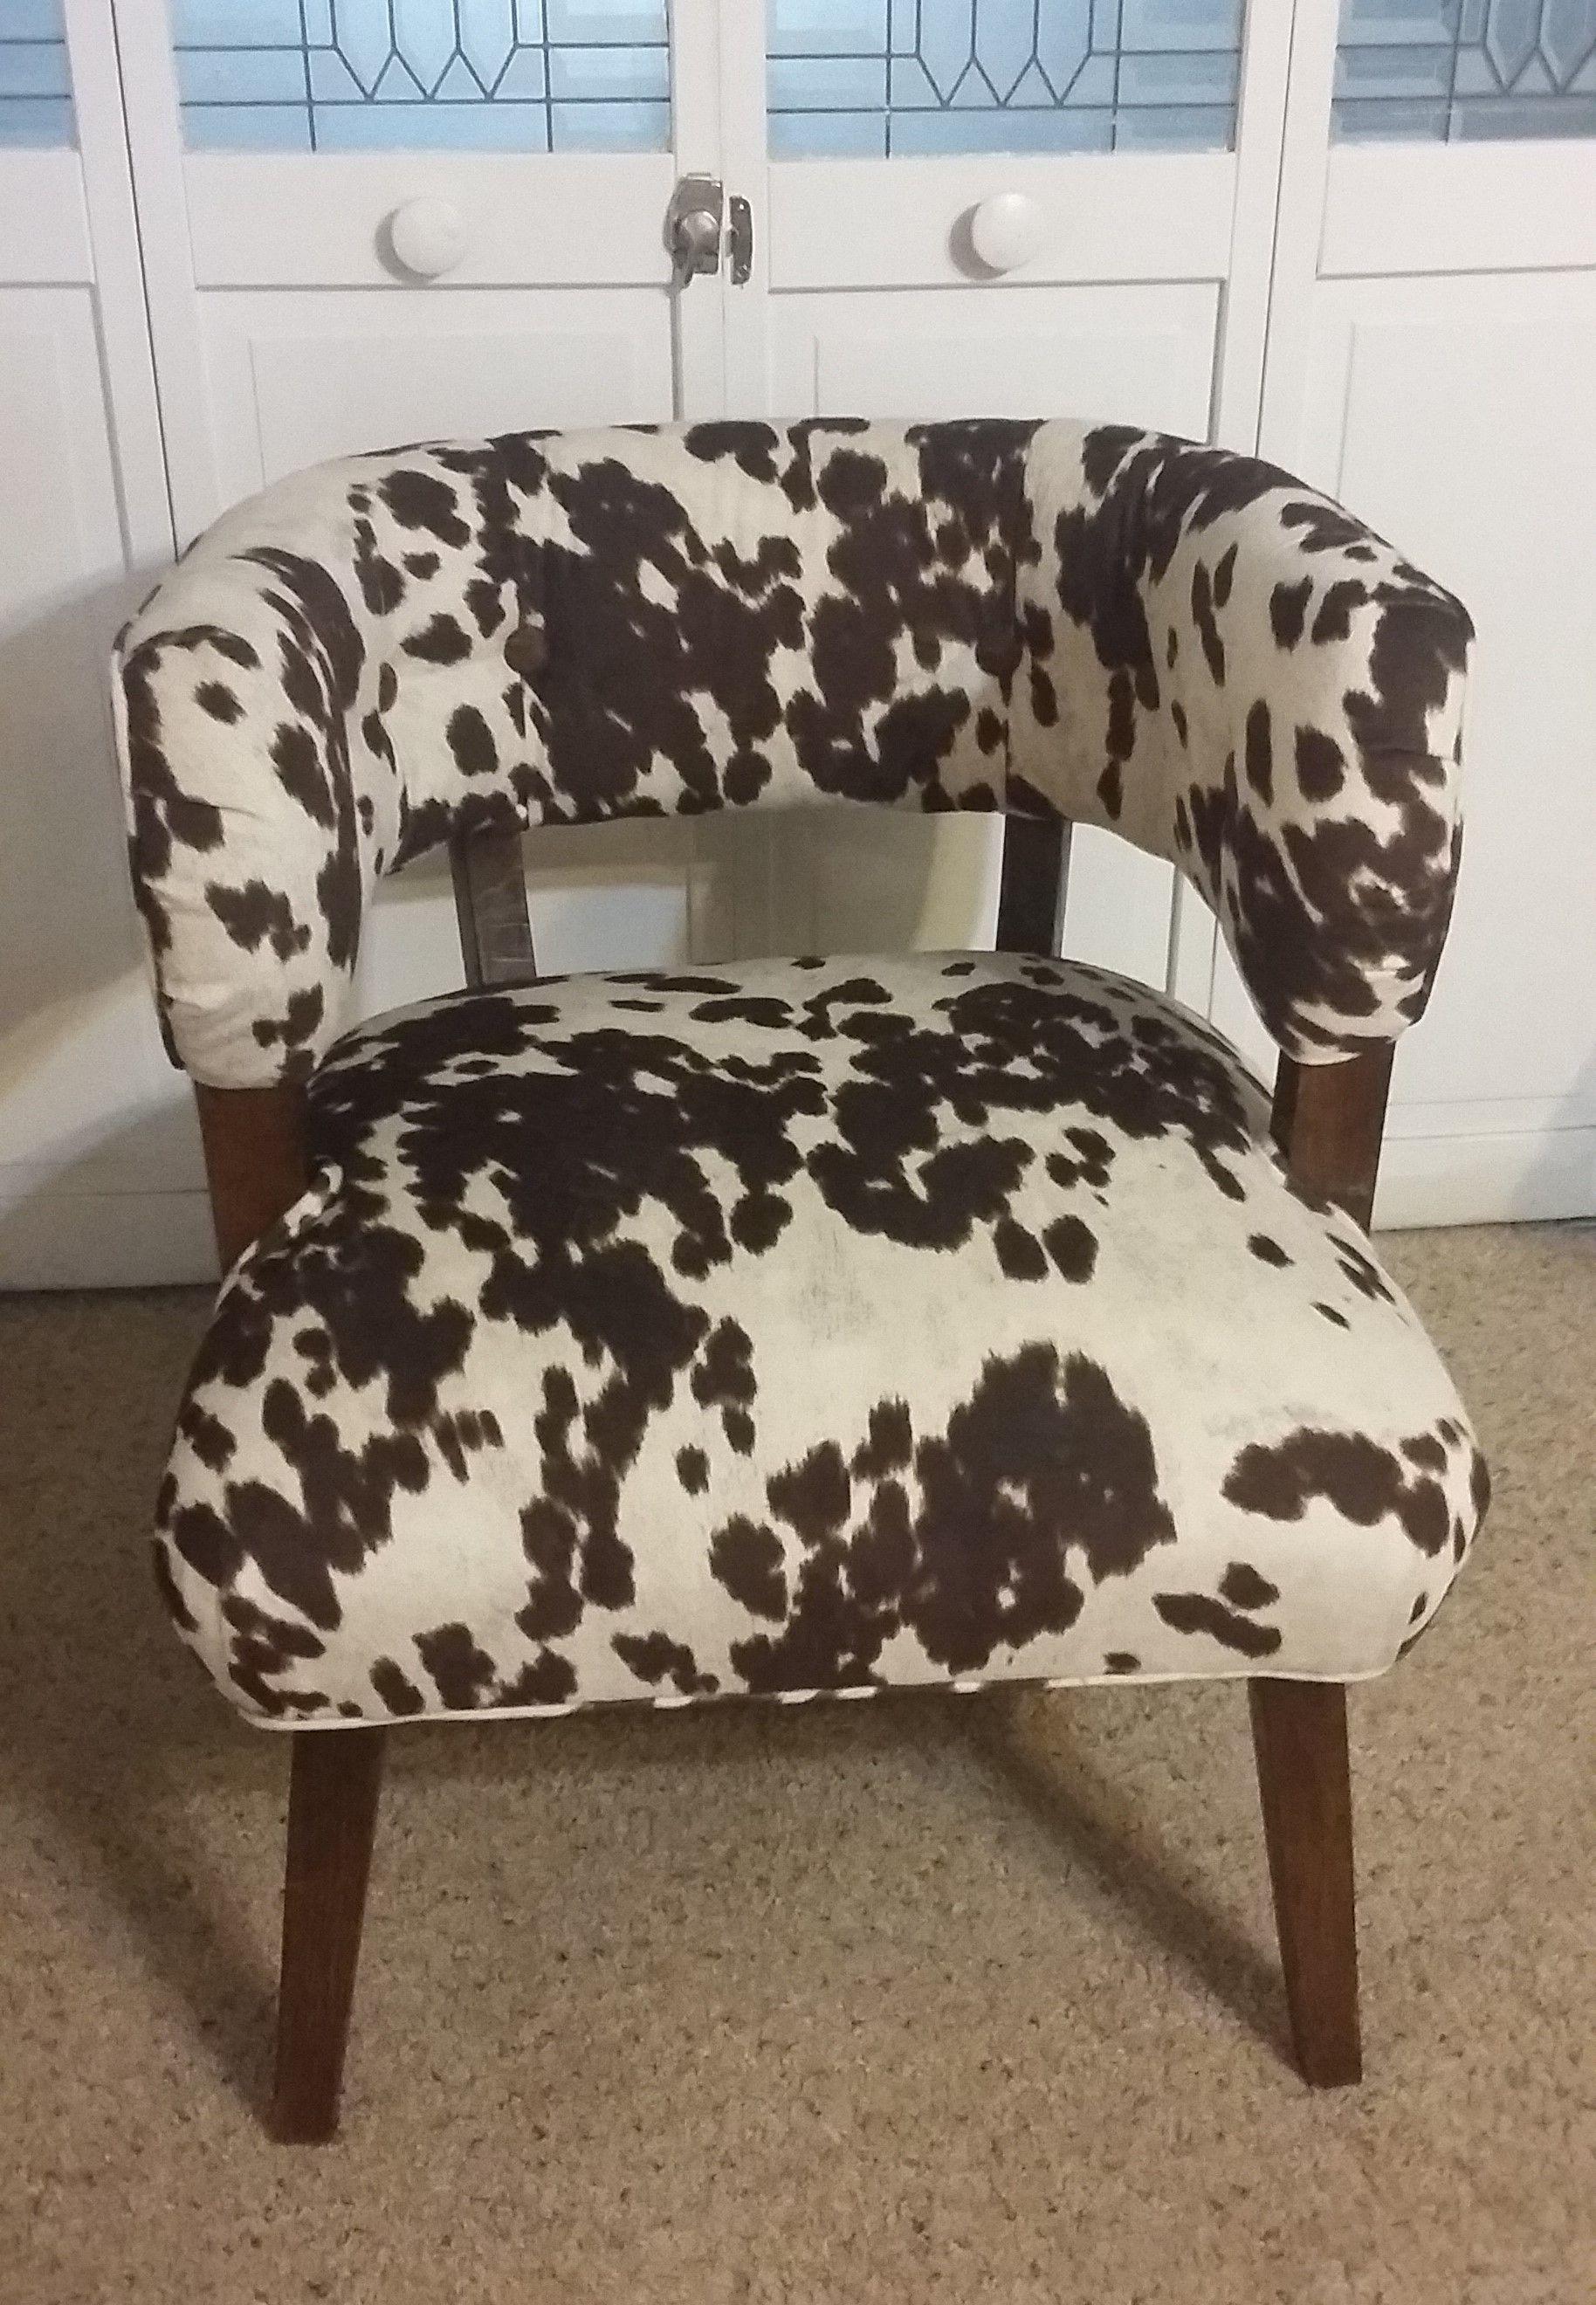 cow print chair and ottoman